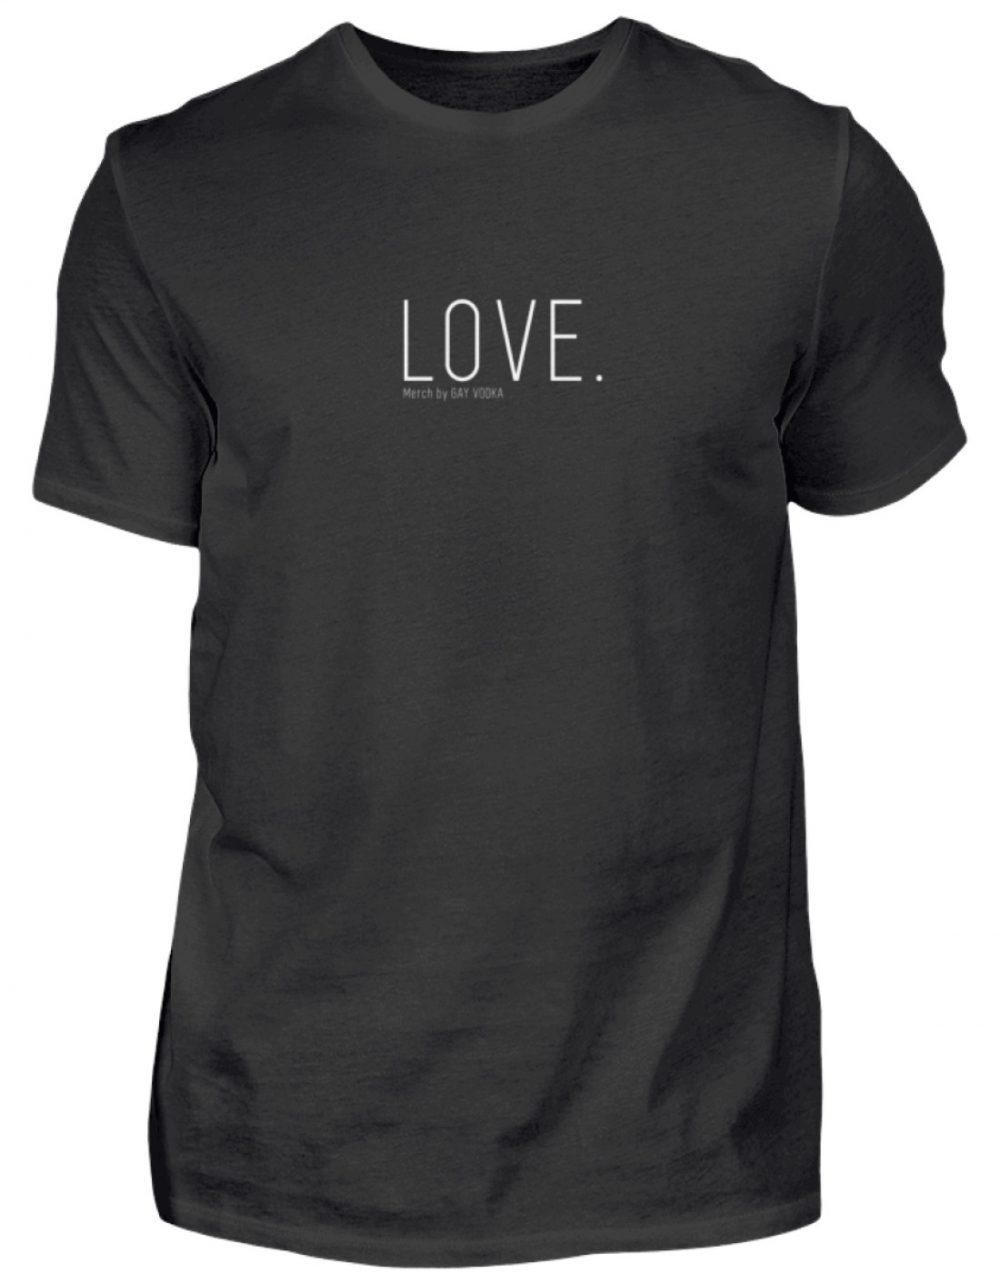 LOVE. - Herren Shirt-16